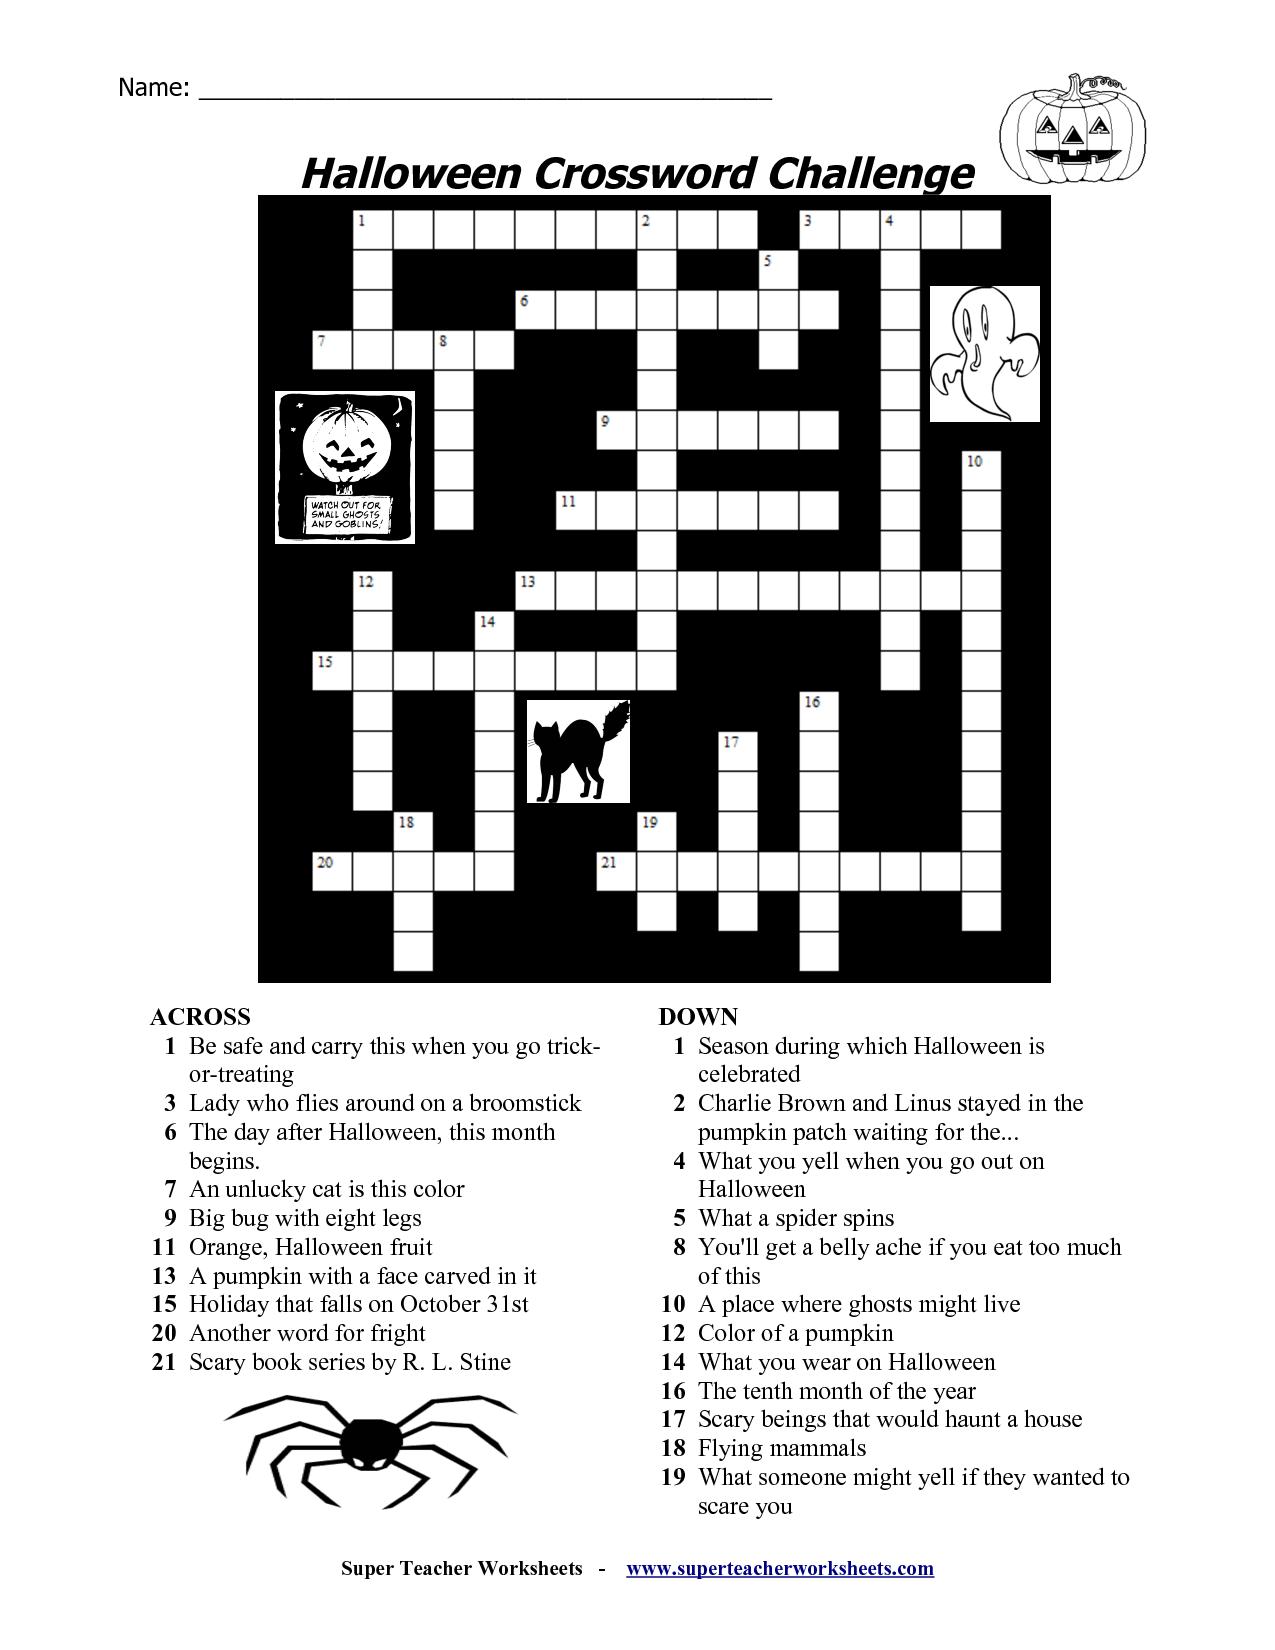 Printable Halloween Crossword Puzzles For Kids